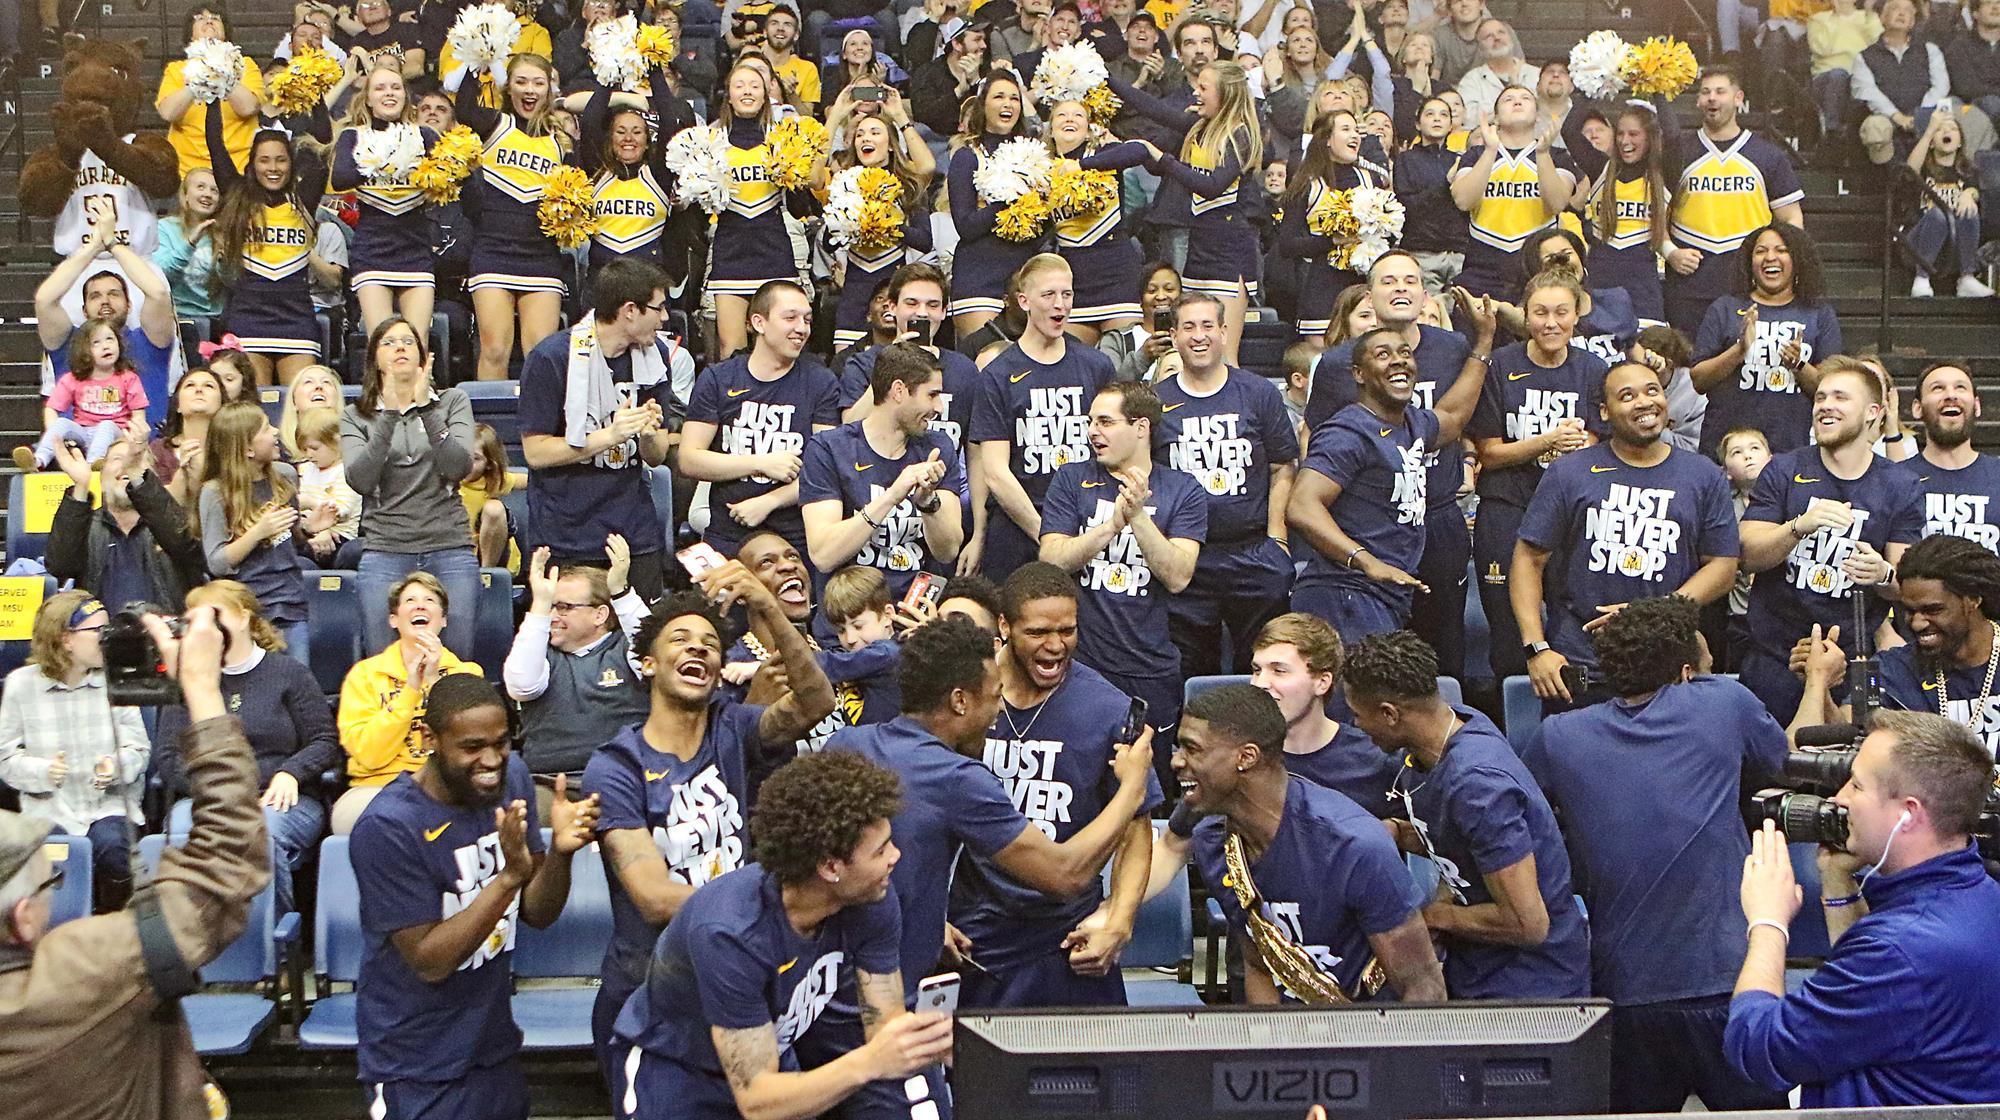 WVU earns No. 5 seed in NCAA Tournament